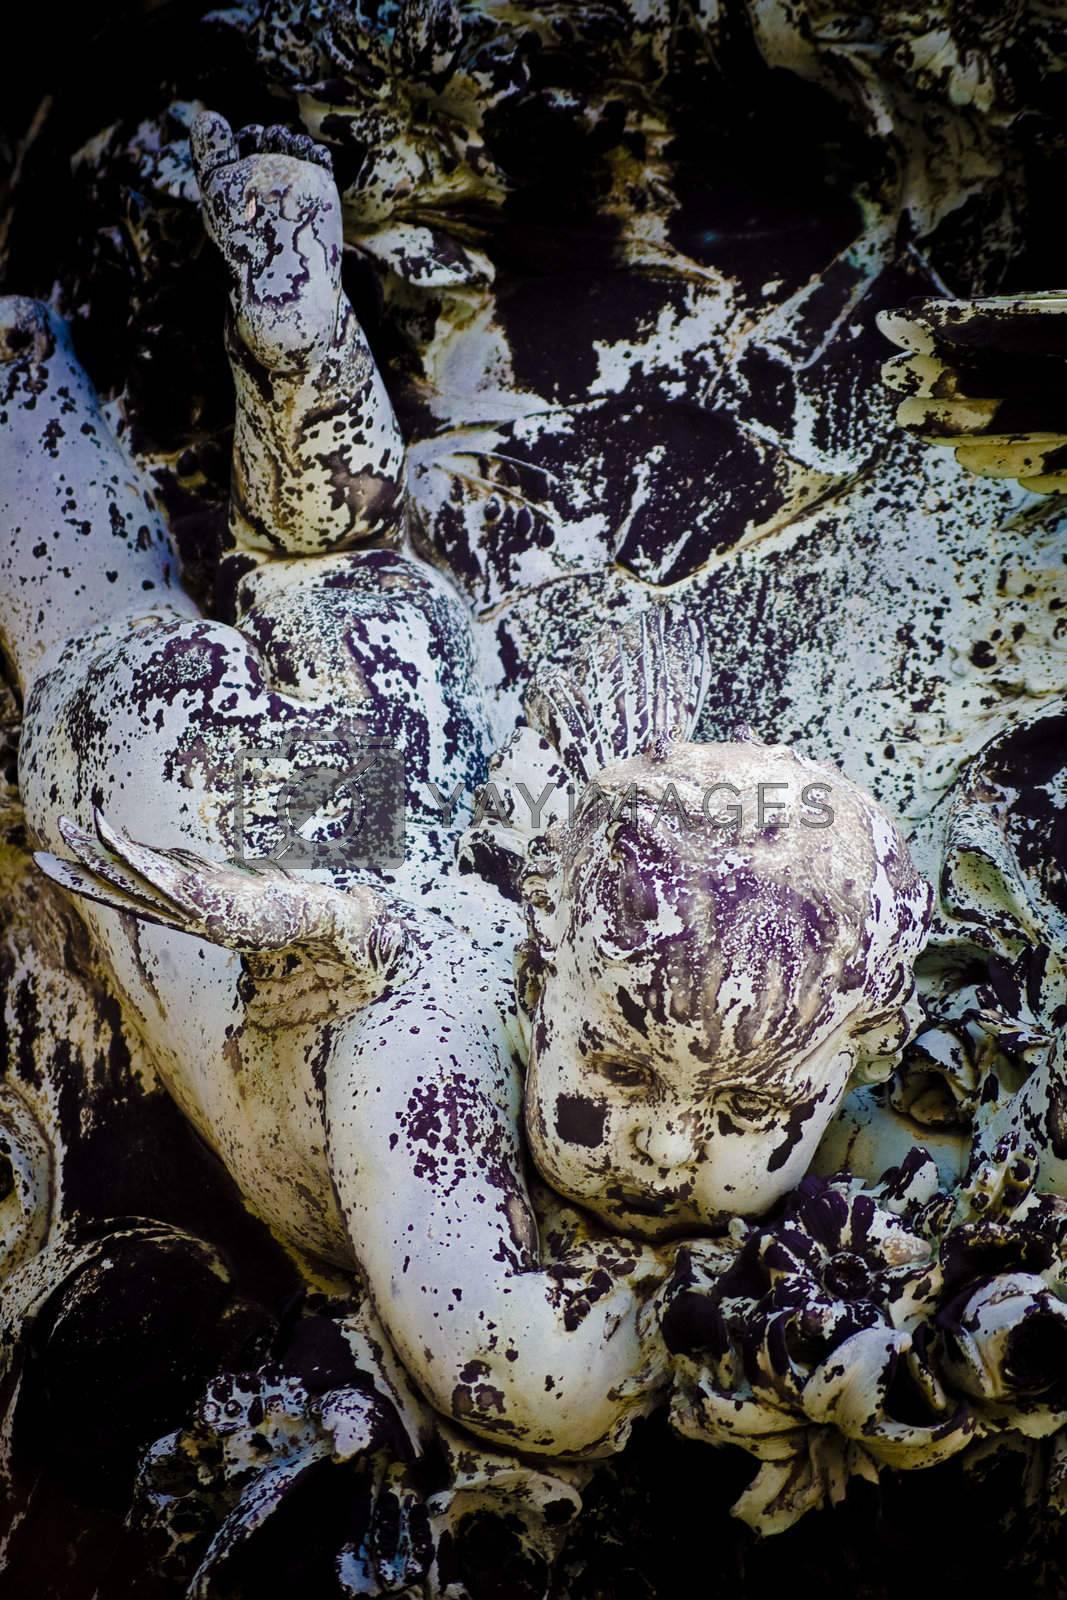 Angels by nimatypografik